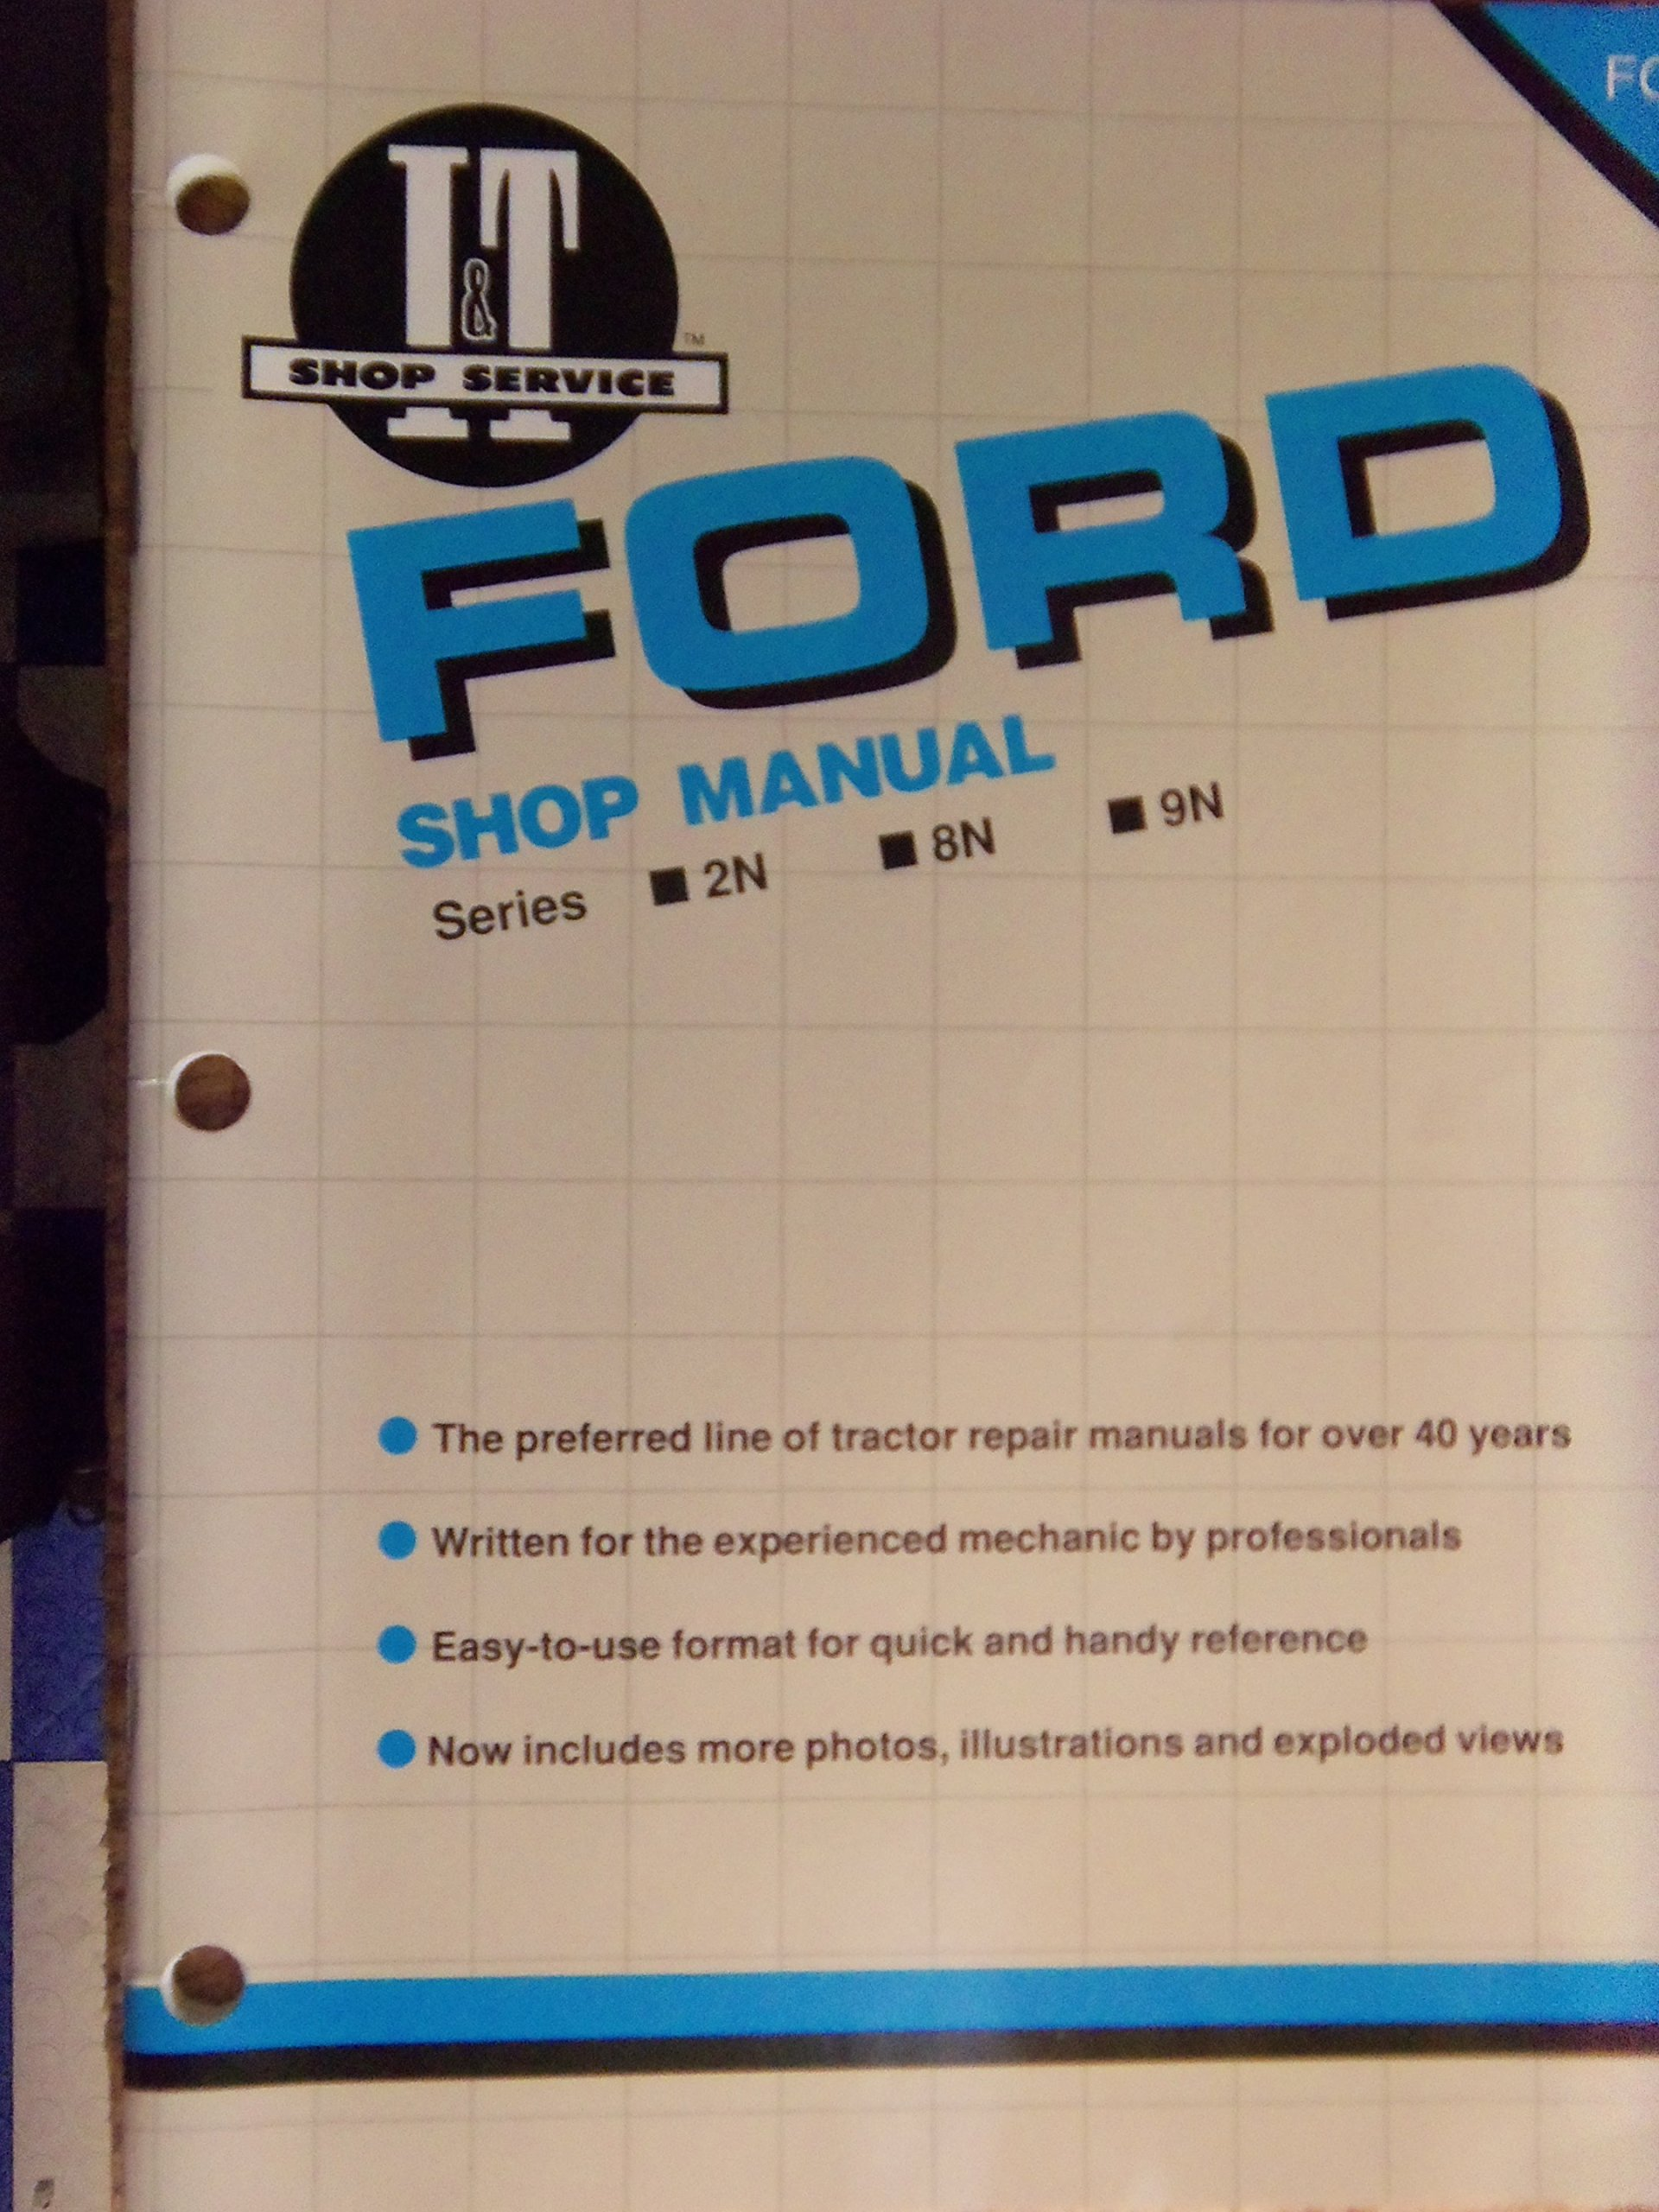 Ford New Holland: I&T Shop Manual Series 2N, 8N, 9N: 9780872886070:  Amazon.com: Books